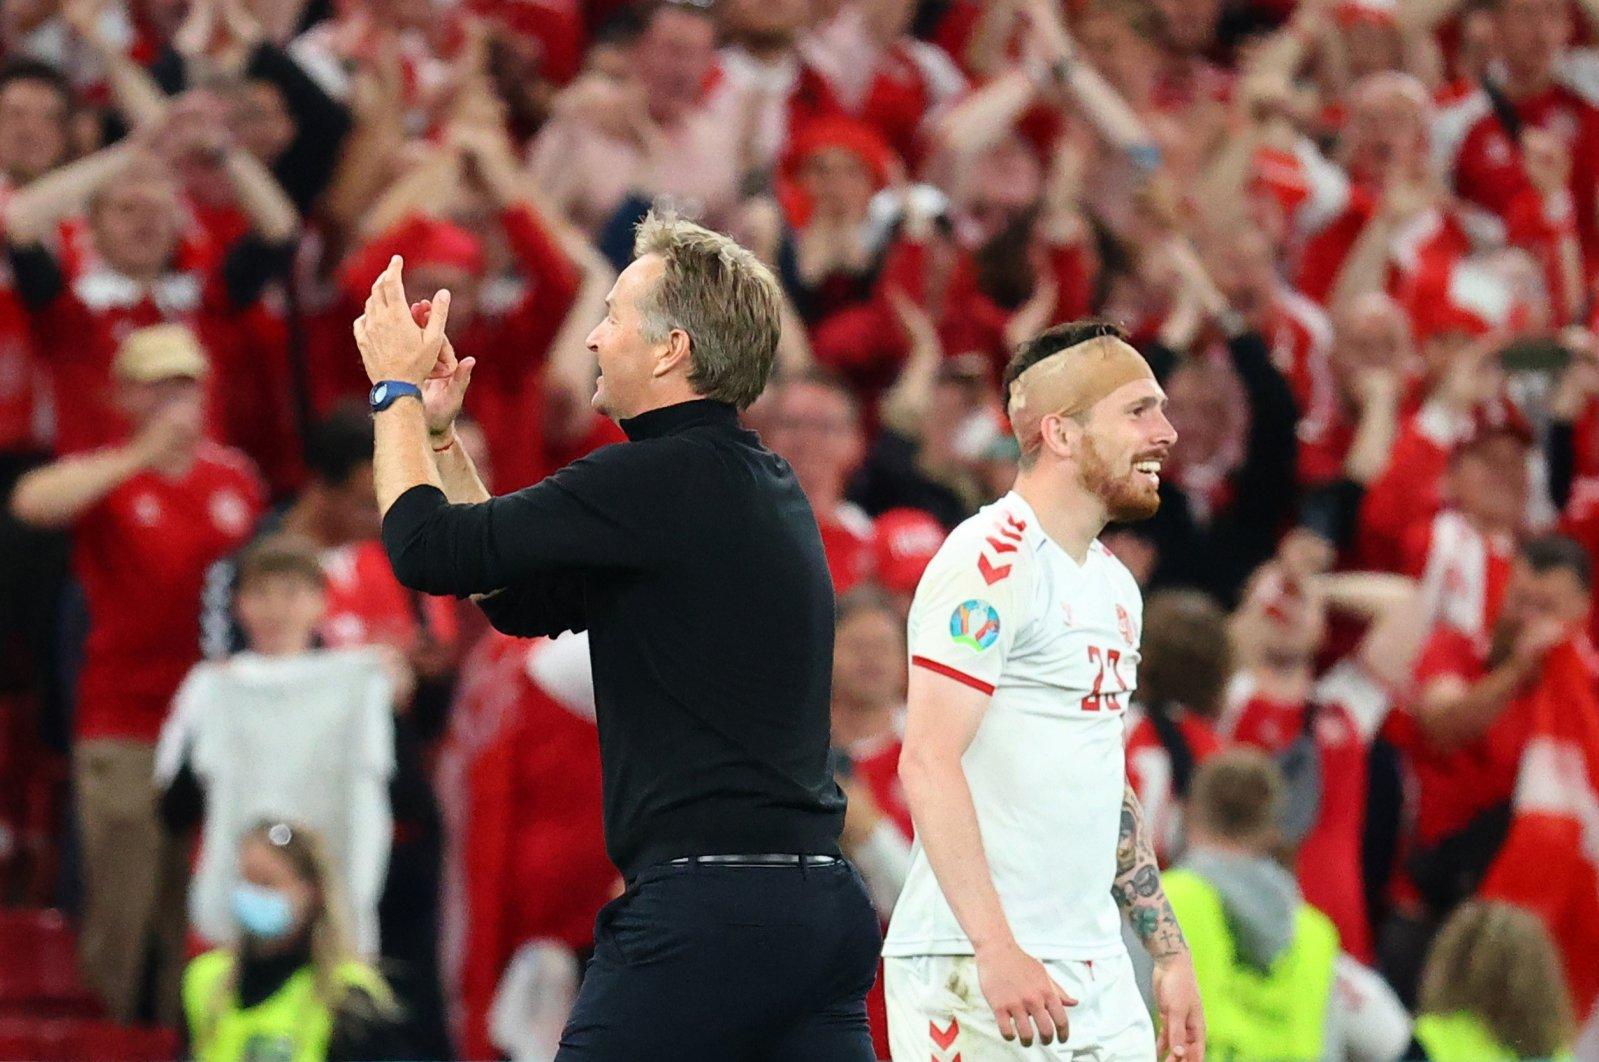 Denmark coach Kasper Hjulmand (L) and Pierre-Emile Hojbjerg celebrate after the Euro 2020 Group B match against Russia at Parken Stadium, Copenhagen, Denmark, June 21, 2021. (Reuters Photo)